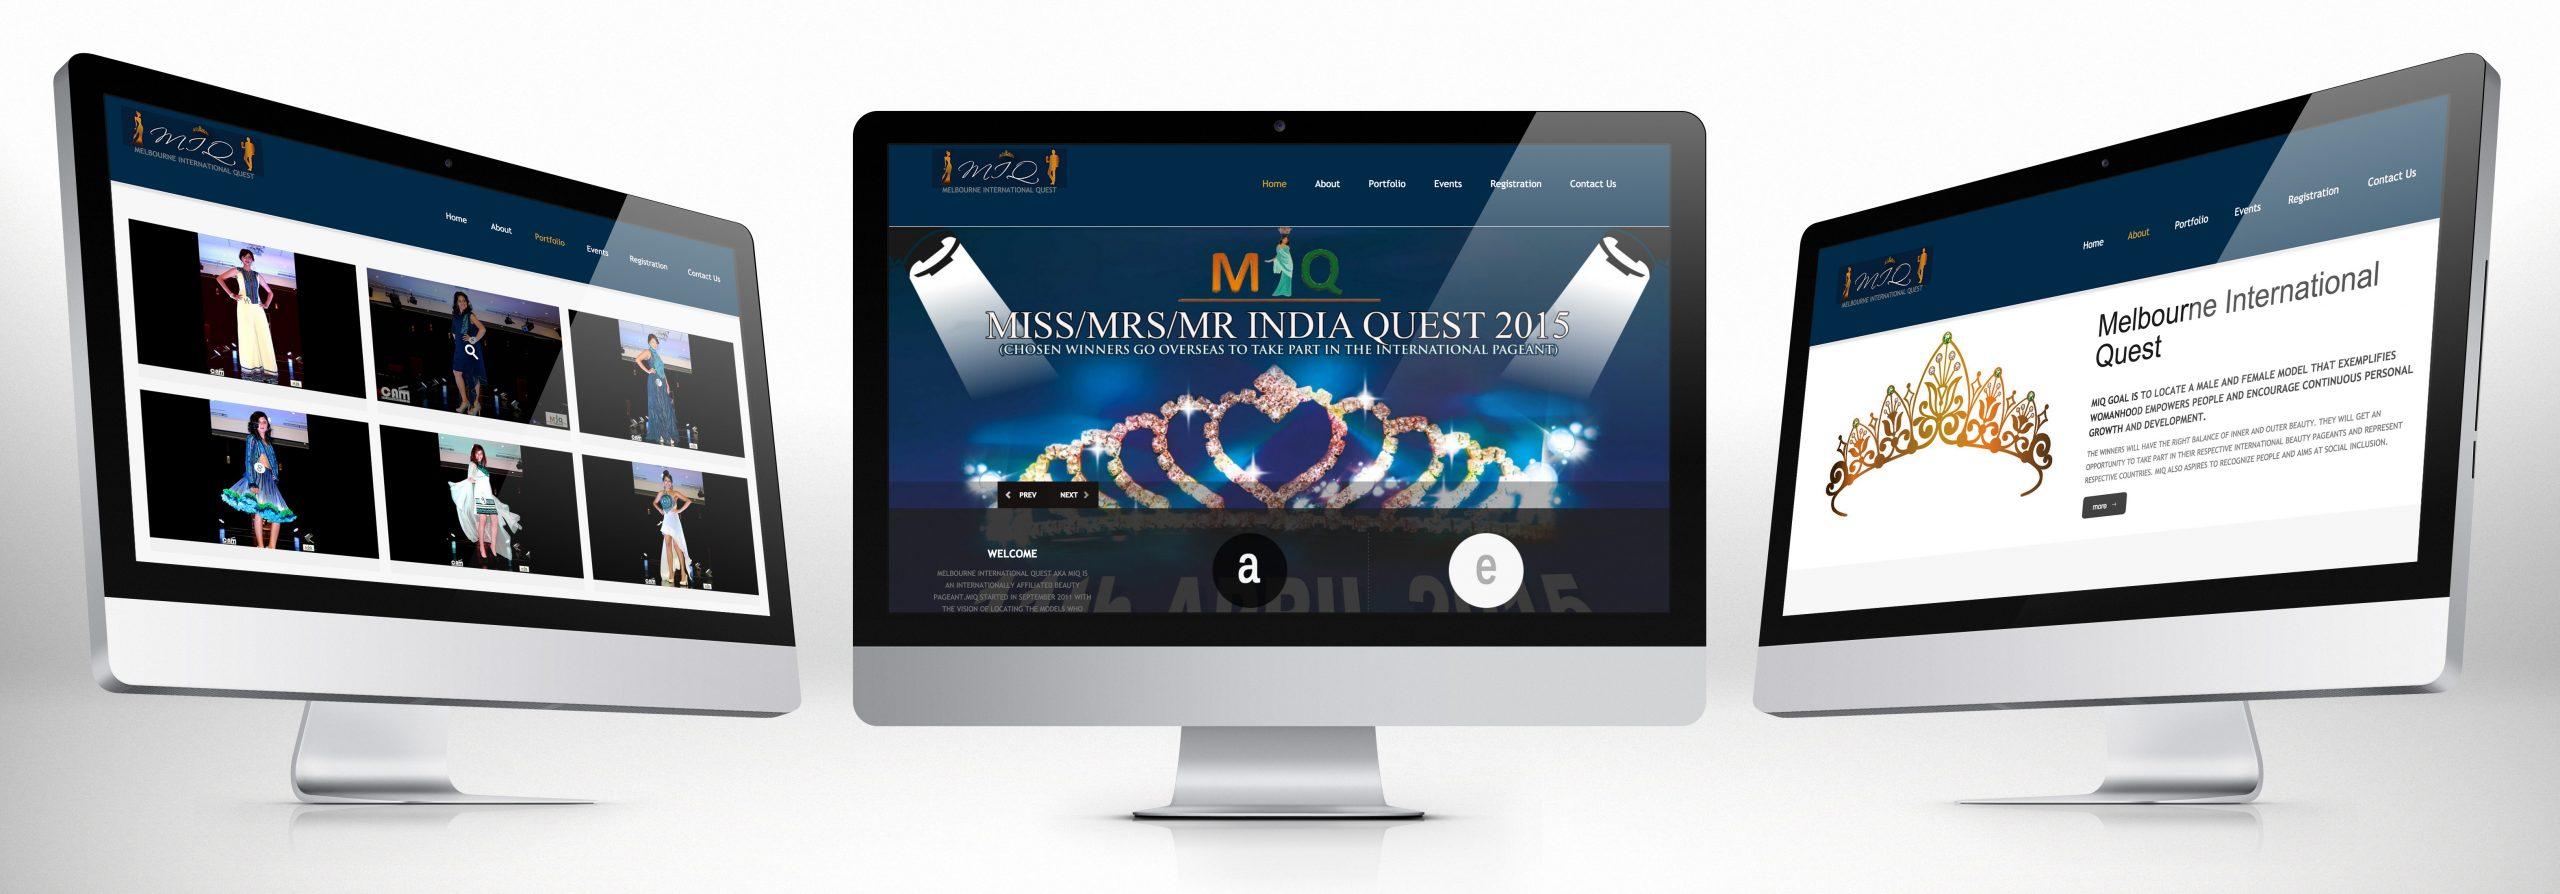 www.miq.com.au